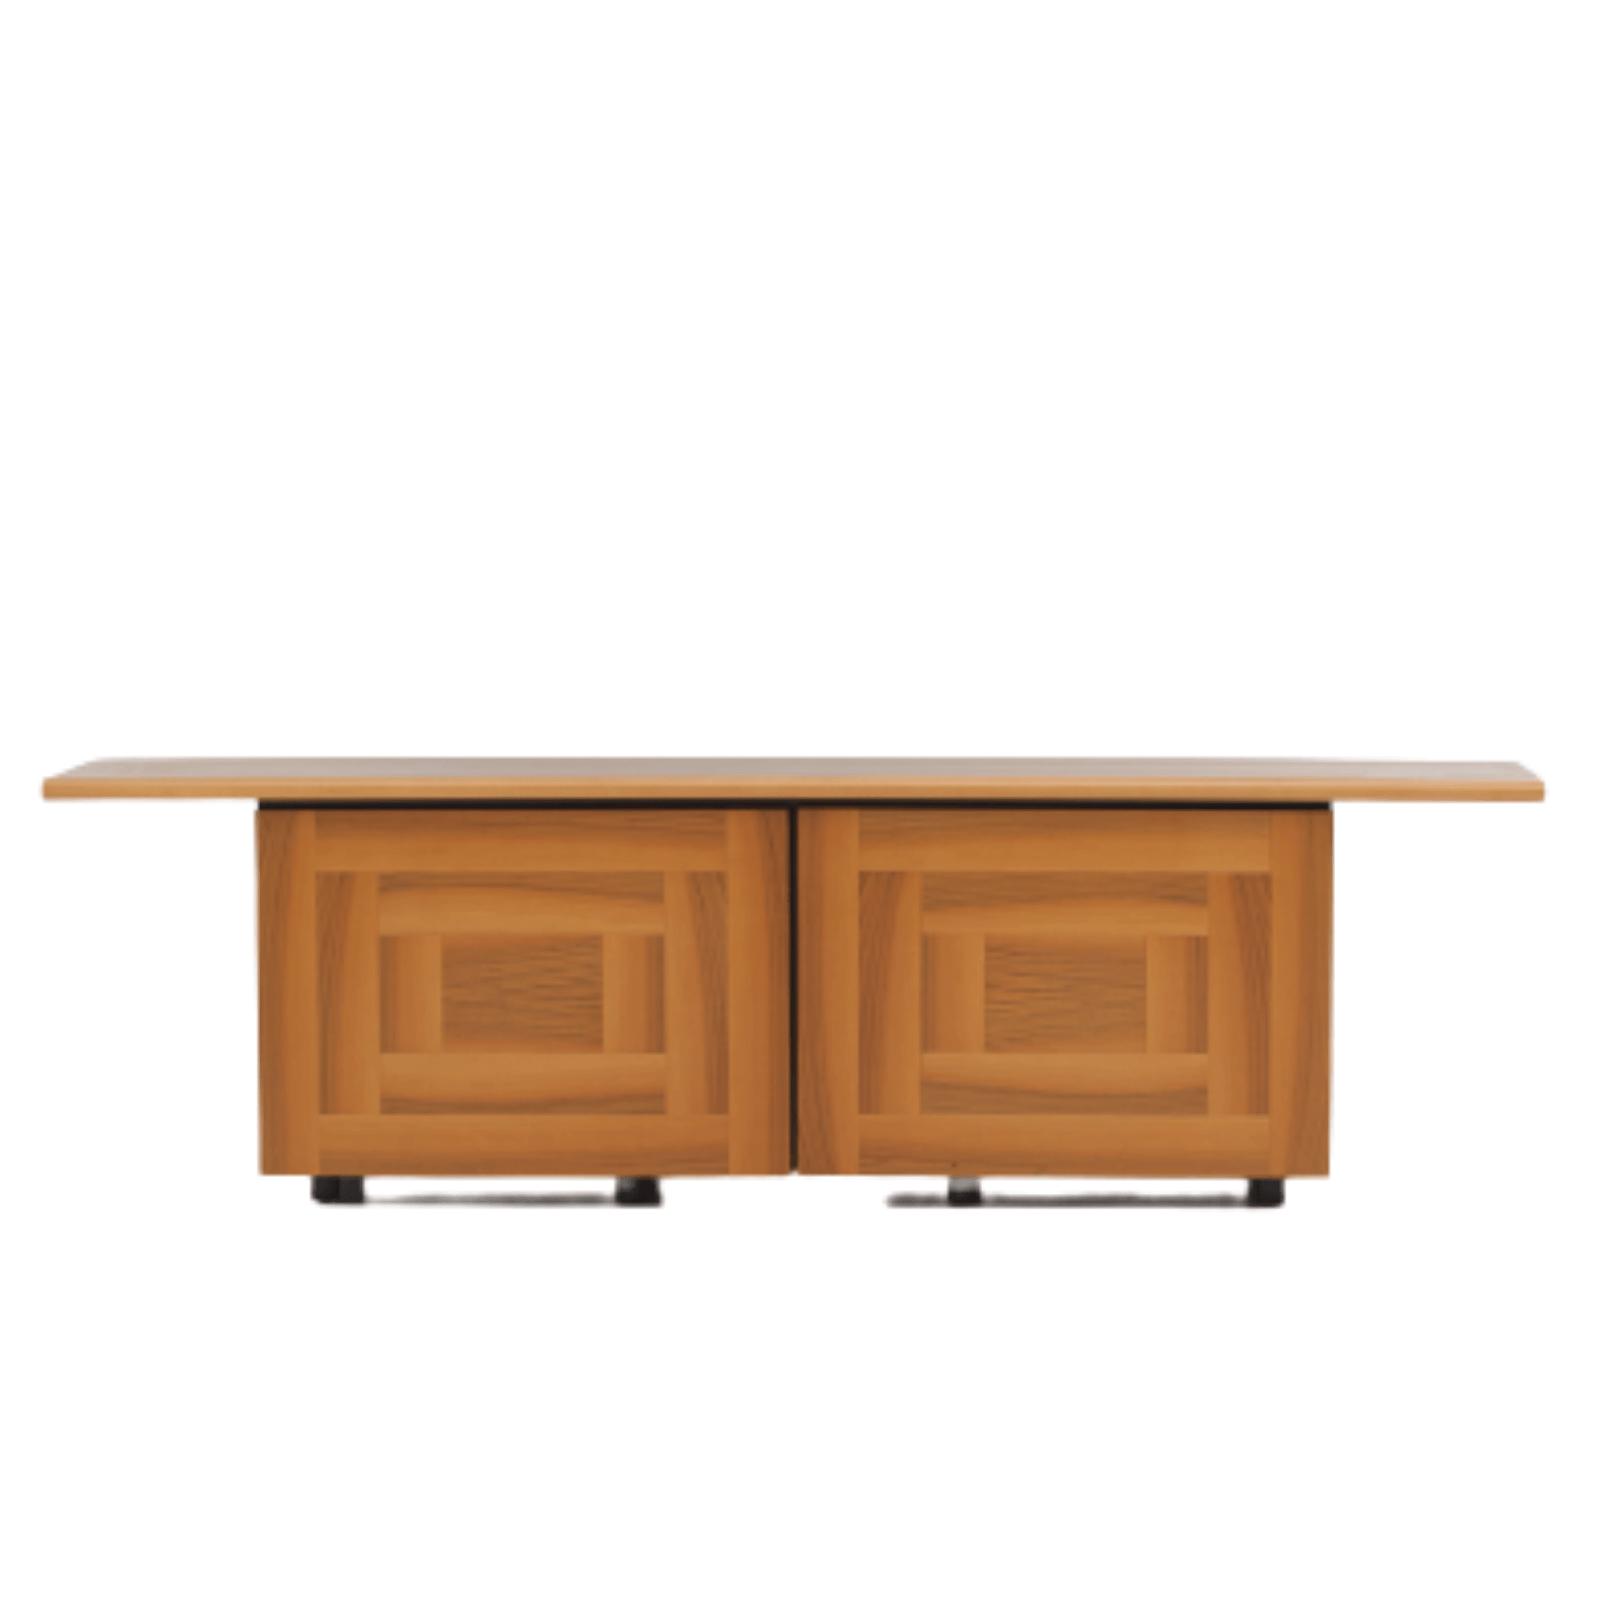 Two Design Lovers Acerbis Sheraton Sideboard2